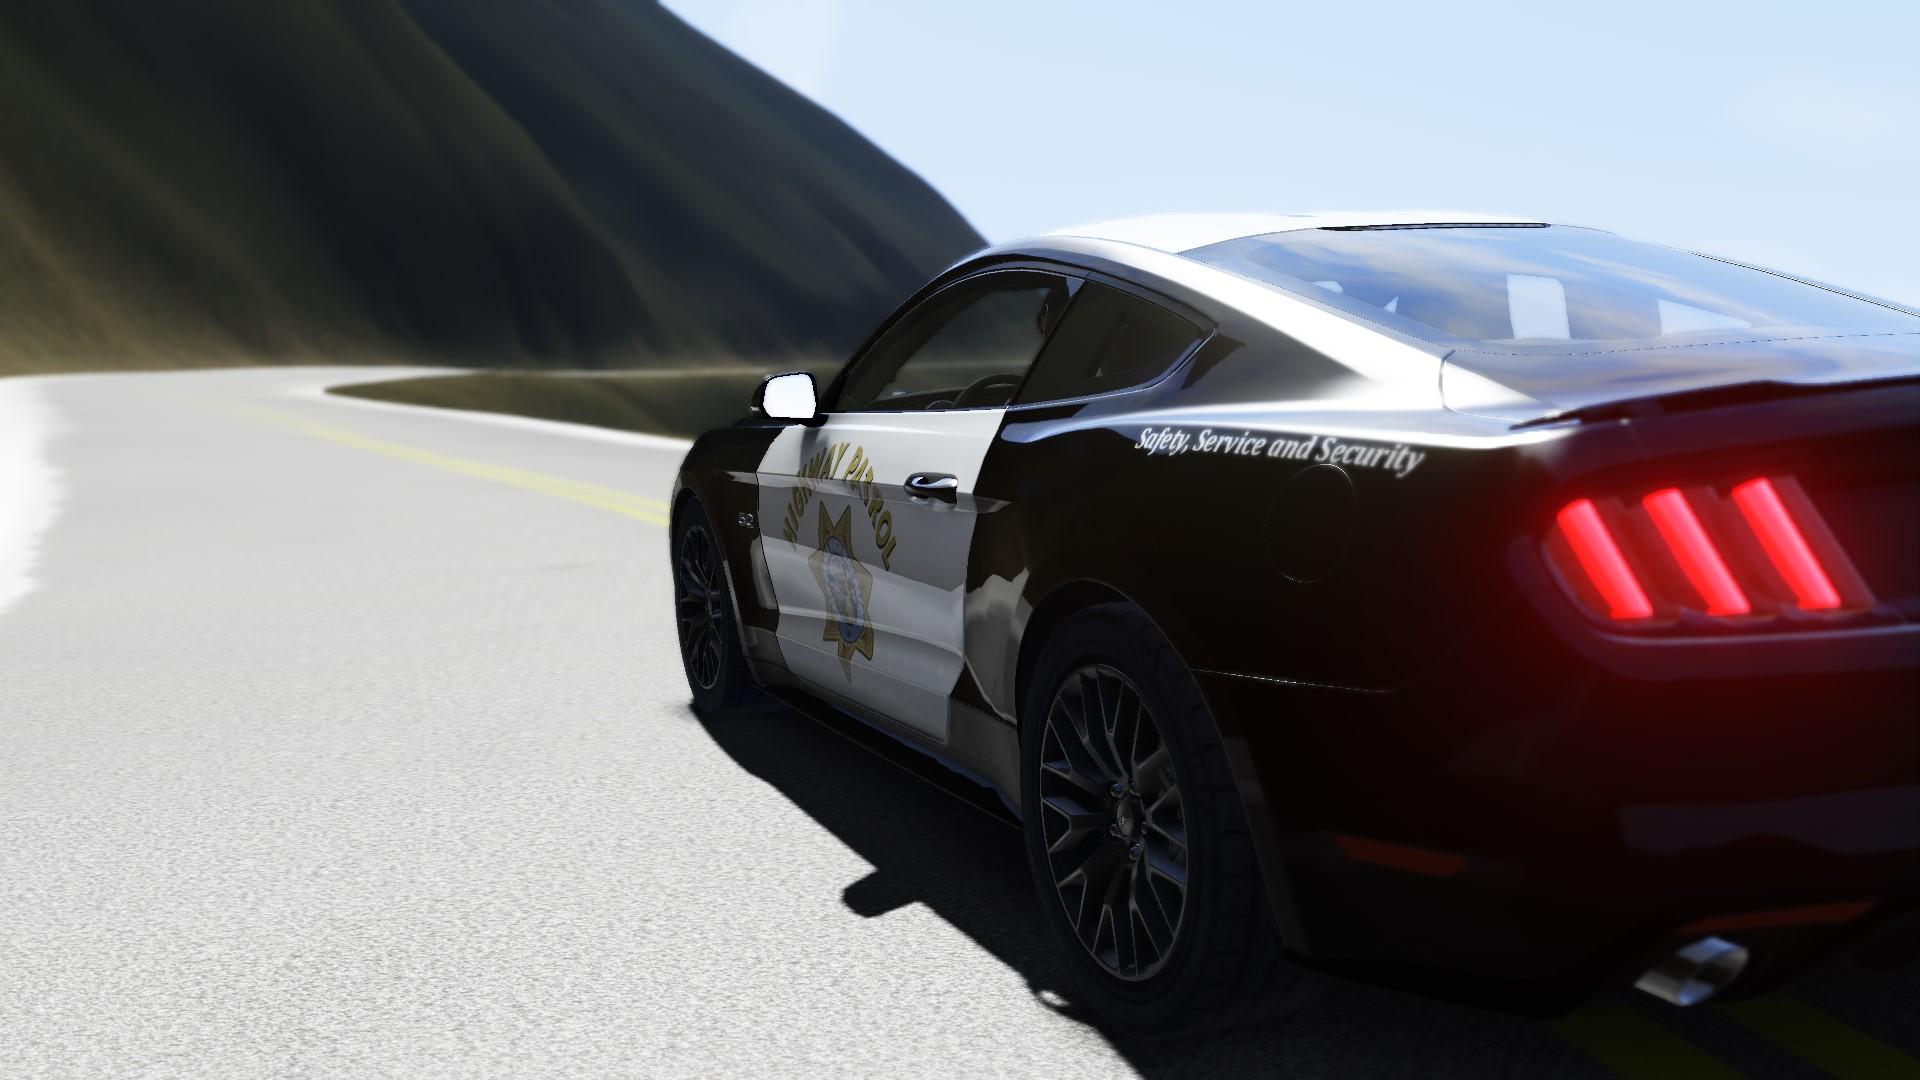 Mustang-Pacific-Coast-0.2-04.jpg